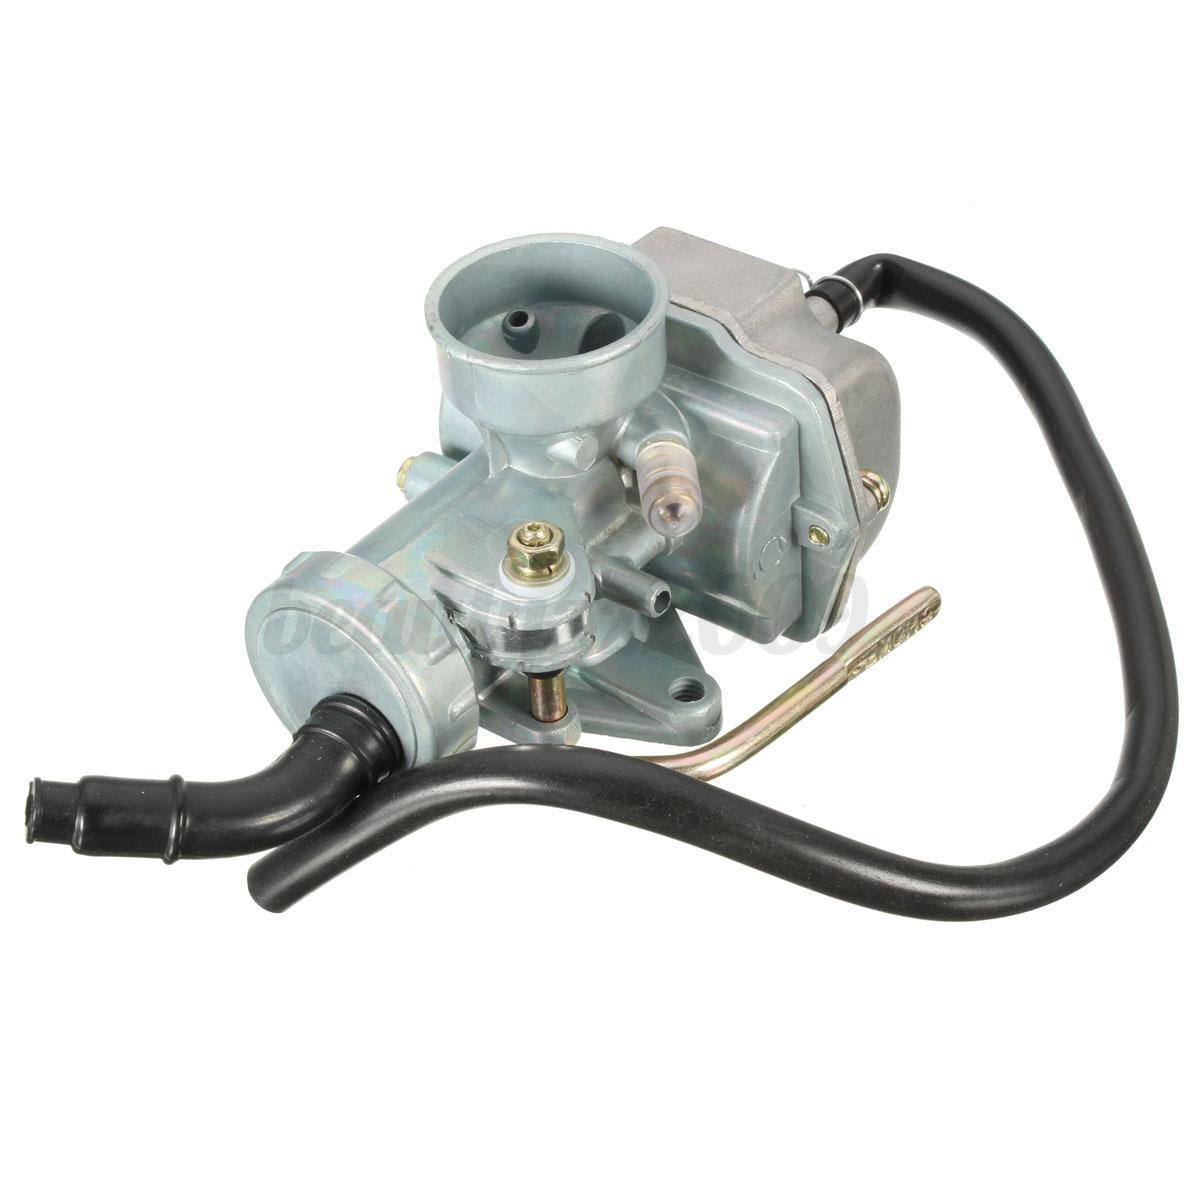 20mm Carburetor Carb Replacement Engine For Honda Xr80